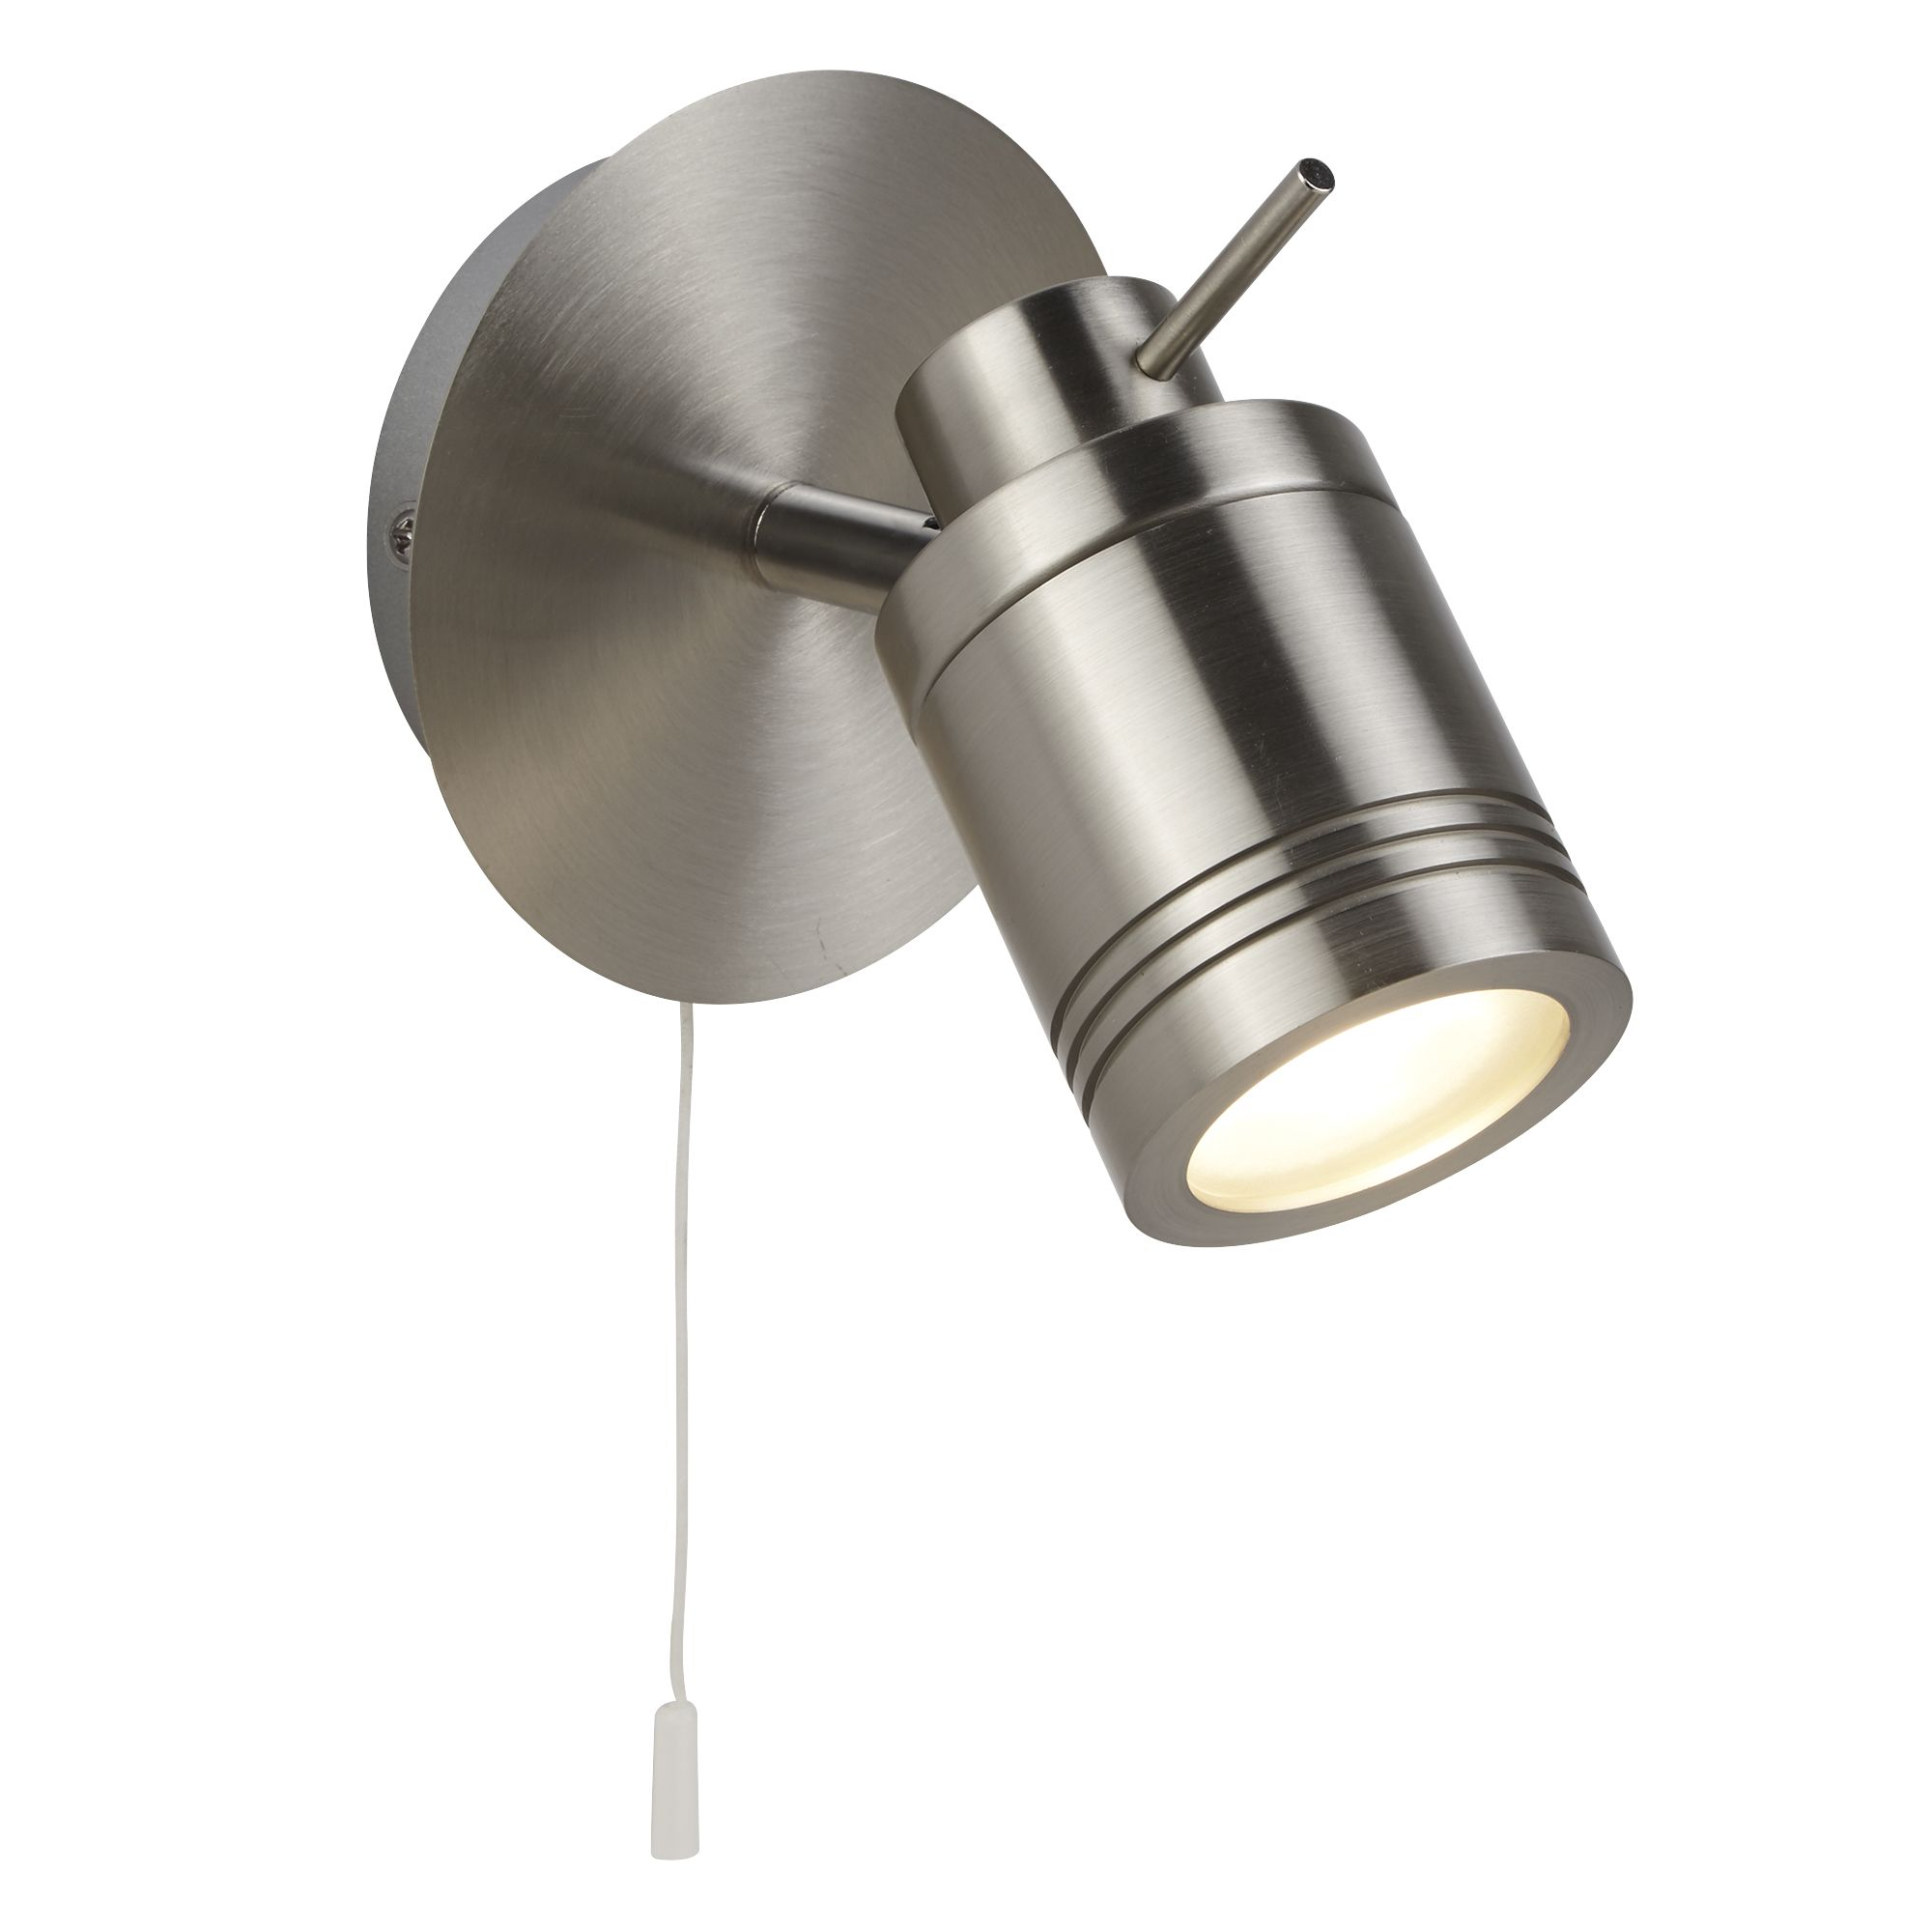 Satin Silver, Ip44 Bathroom Spot Wall Bracket, Switched, Adjustable Head